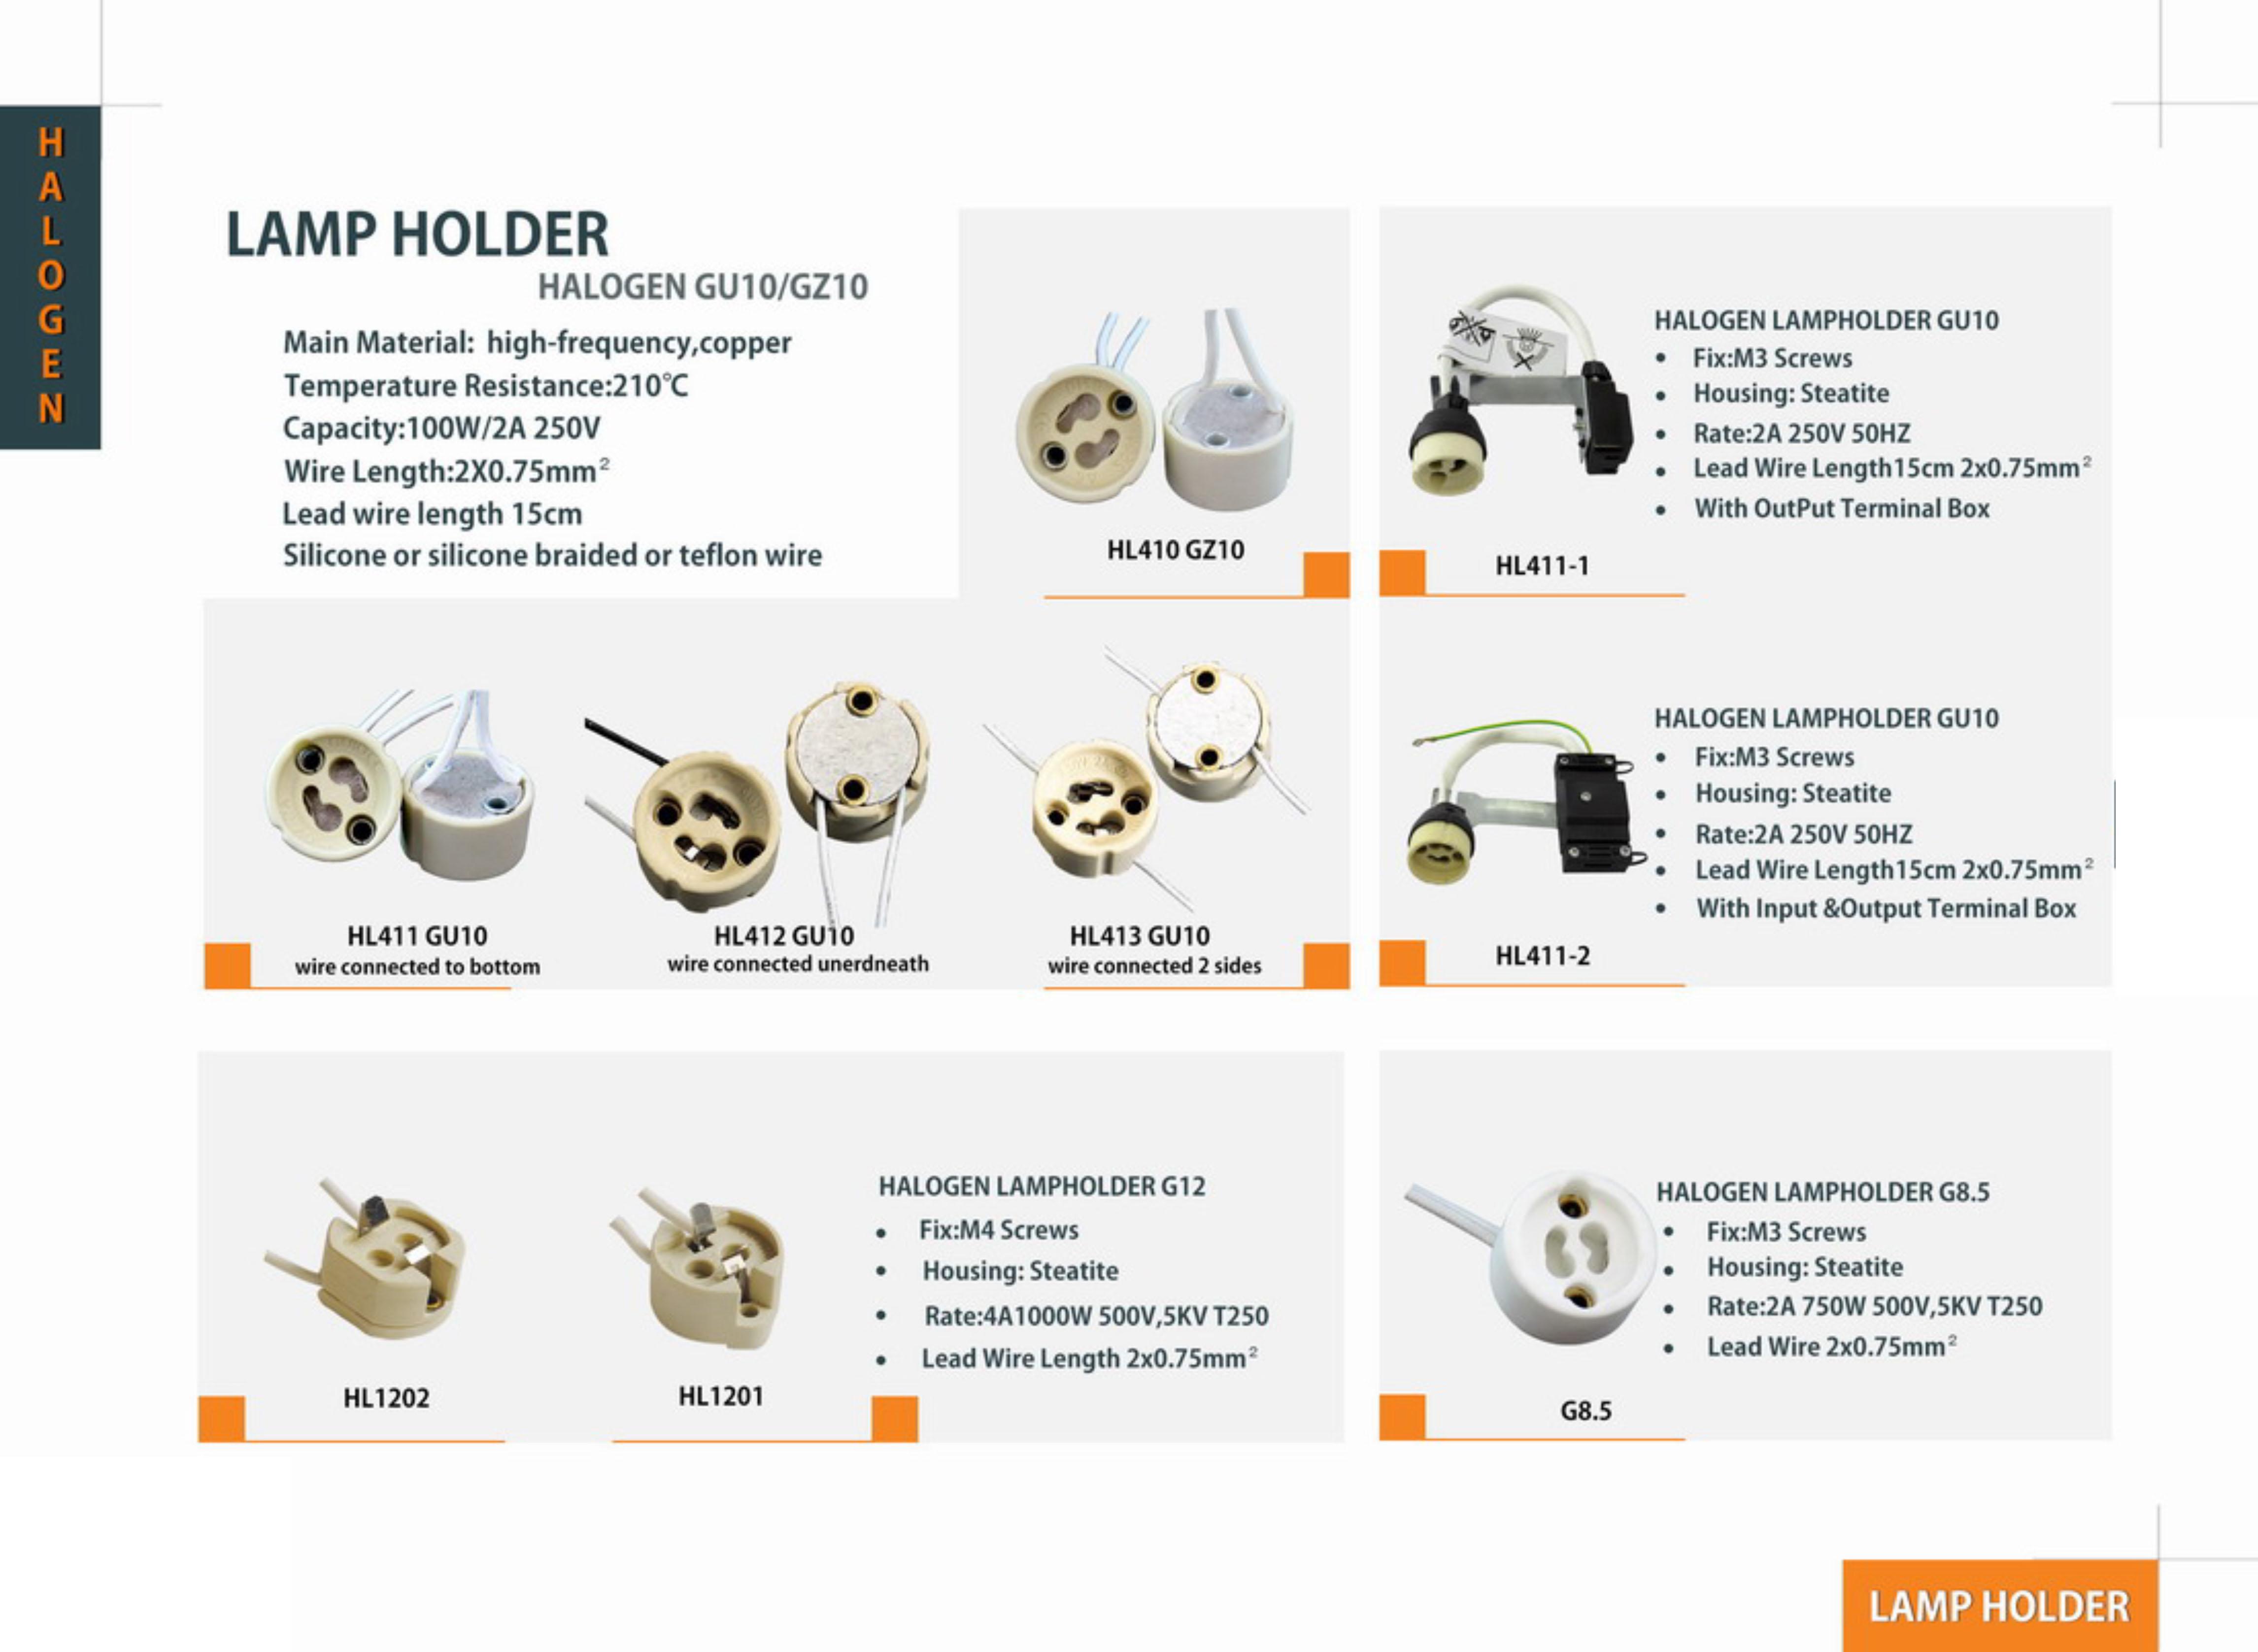 HL411/412/413 GU10 Lamp Holder/Lamp socket/Lamp base